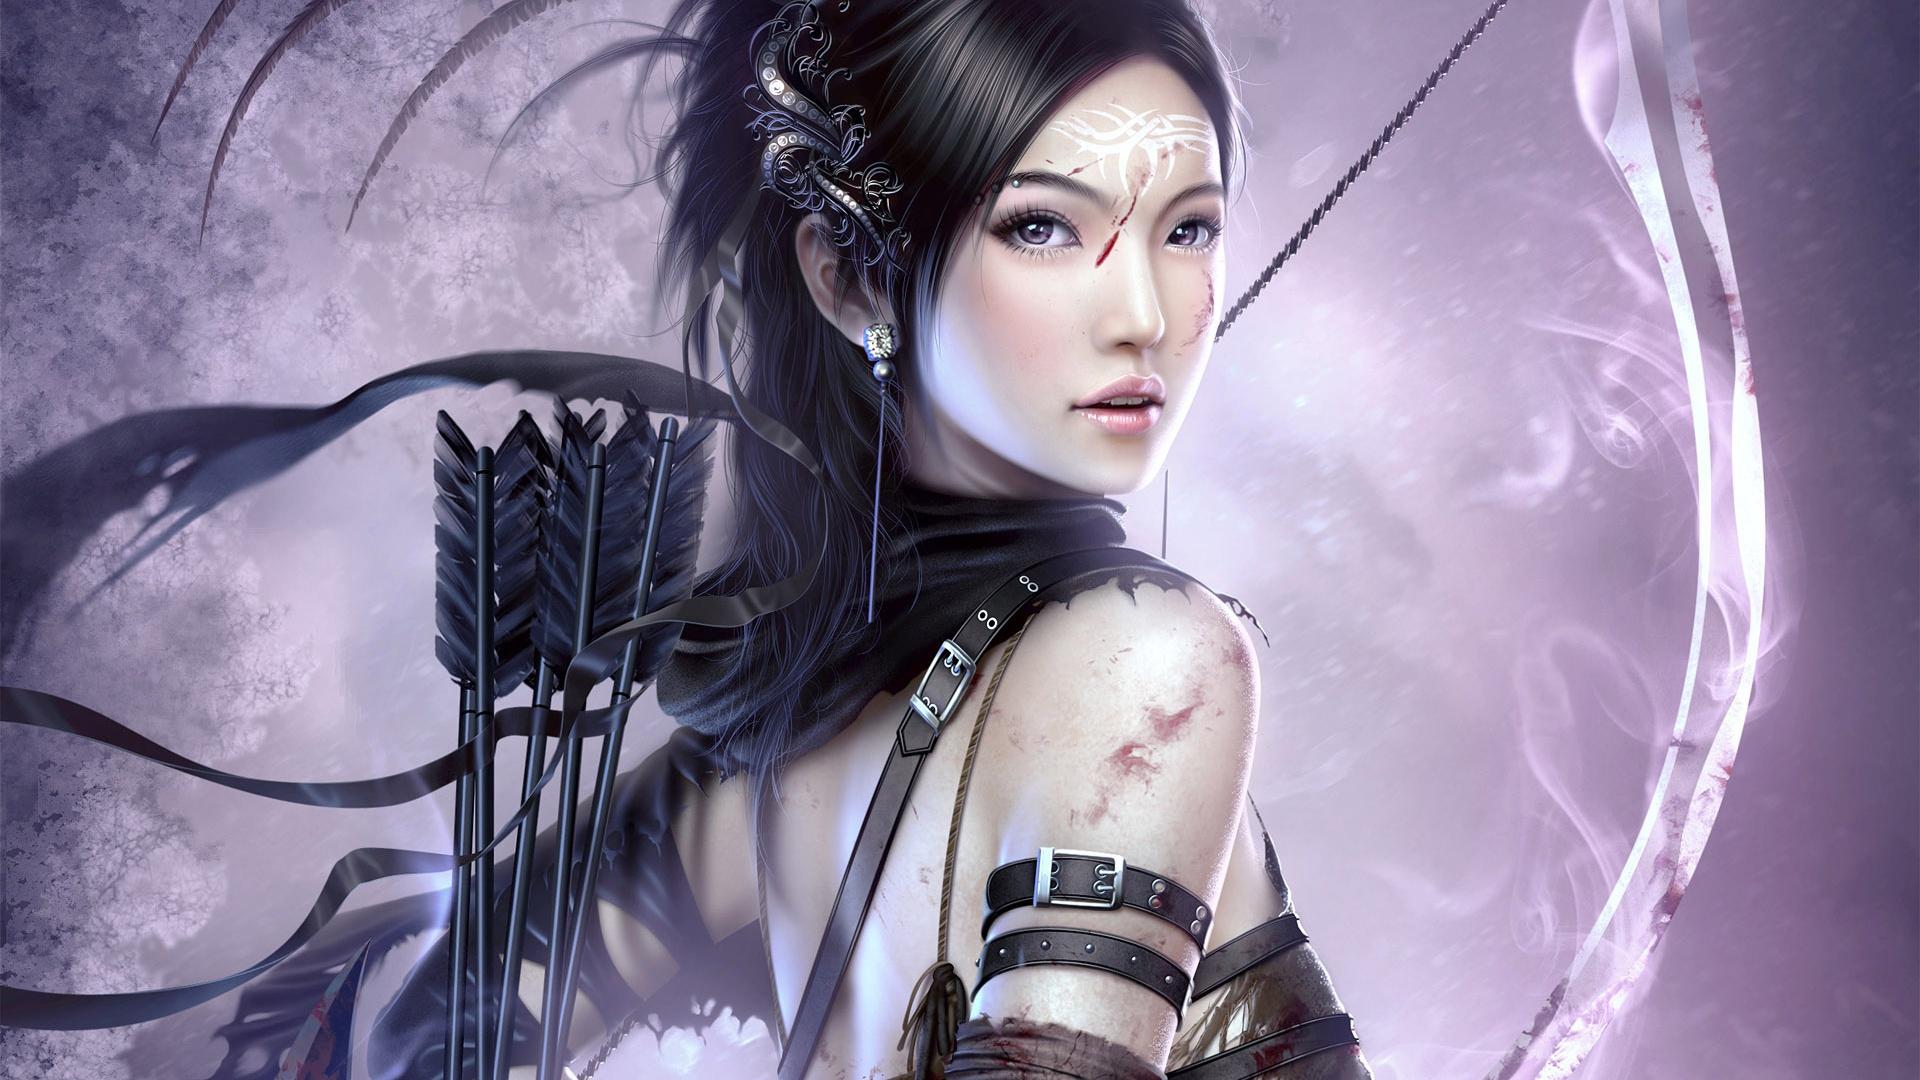 Fantasy Girl Wallpapers HD #6952859